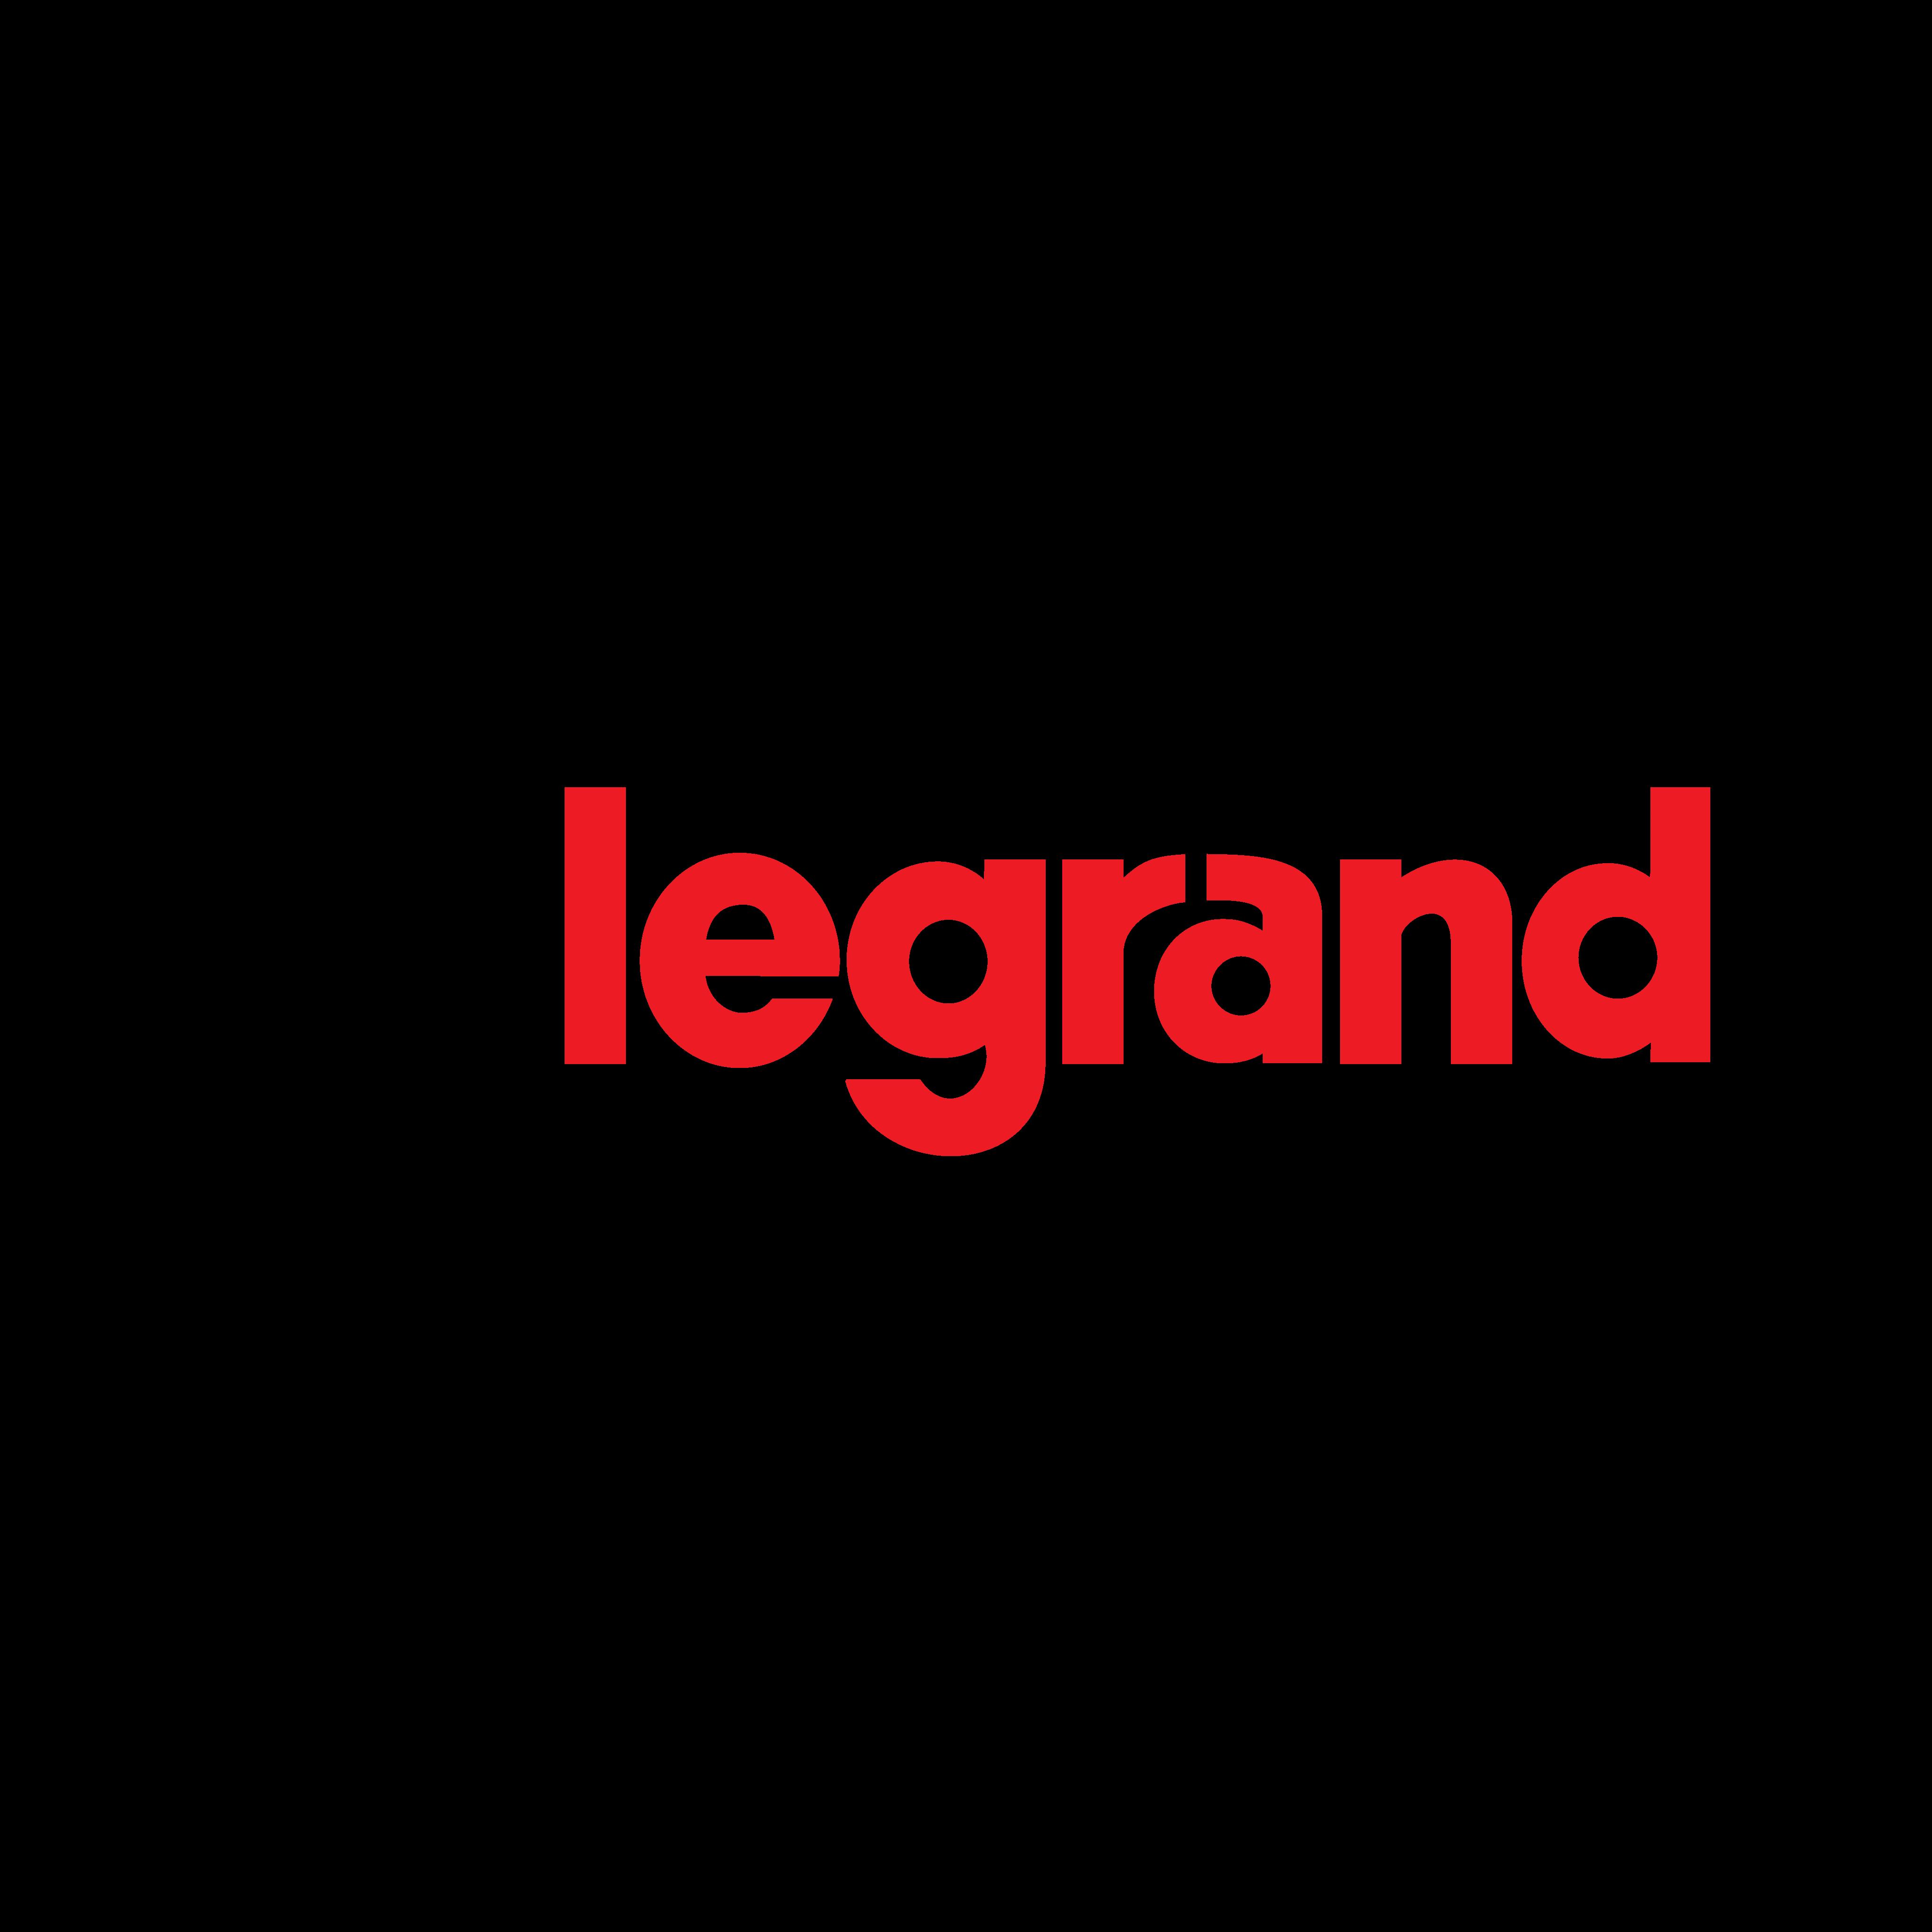 legrand logo 0 - Legrand Logo